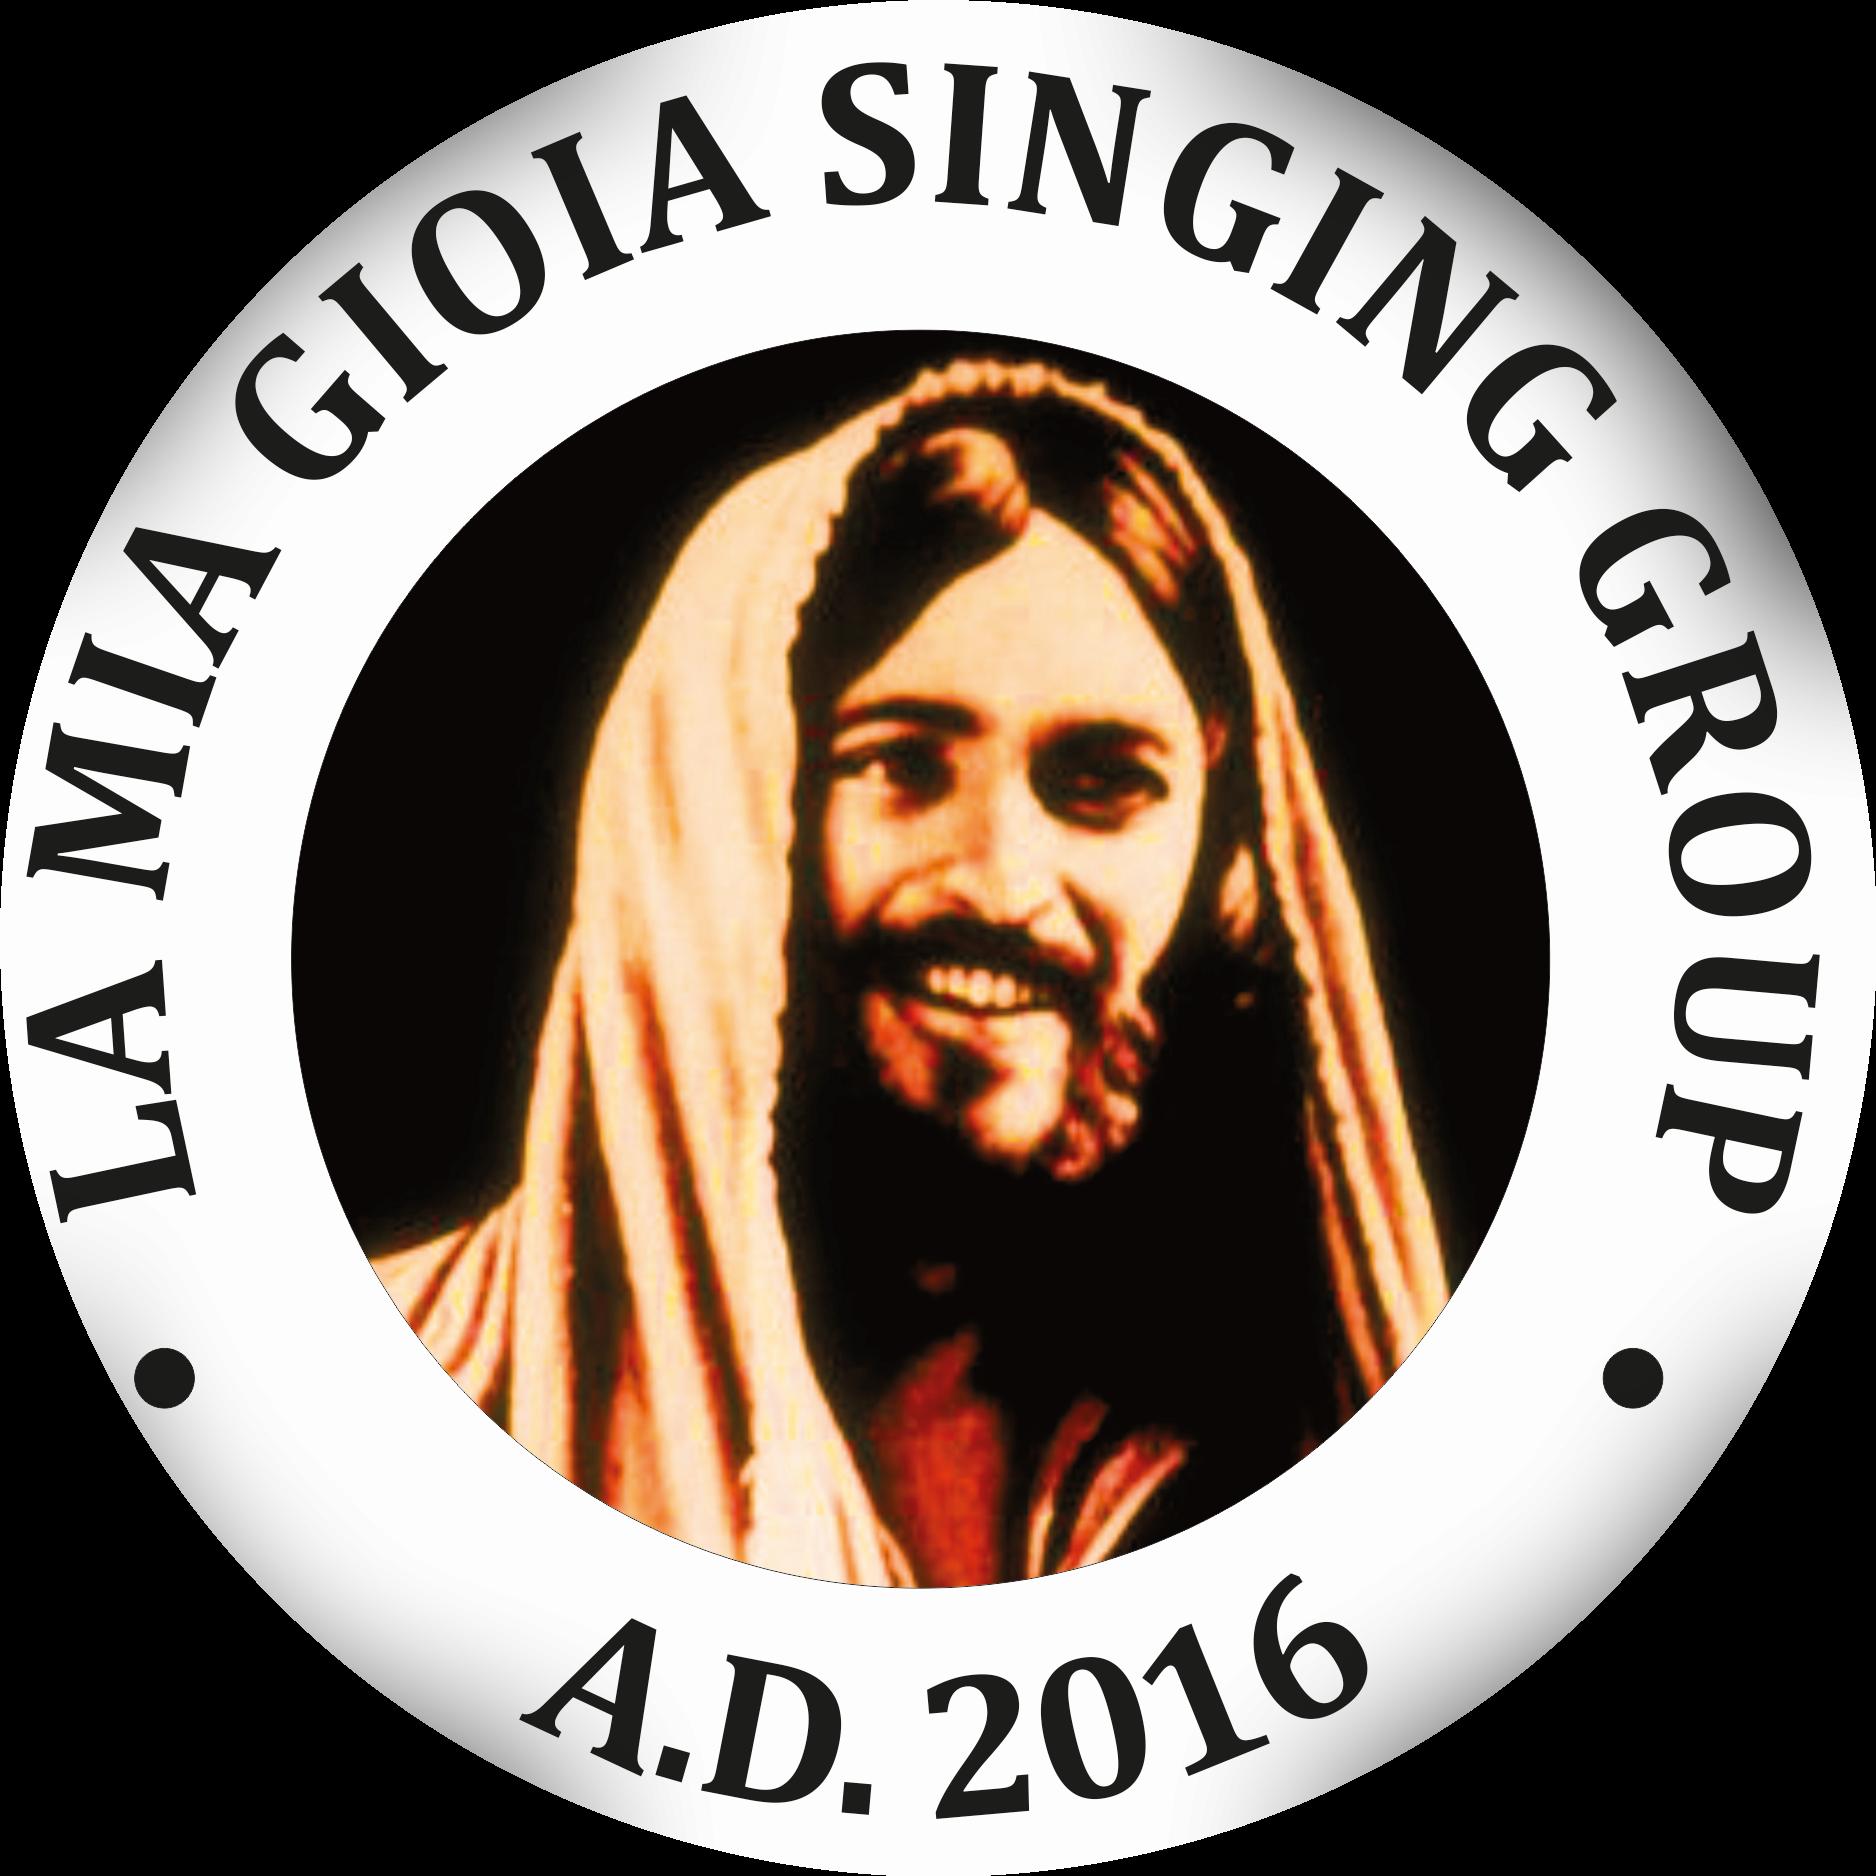 La Mia Gioia Radio Station